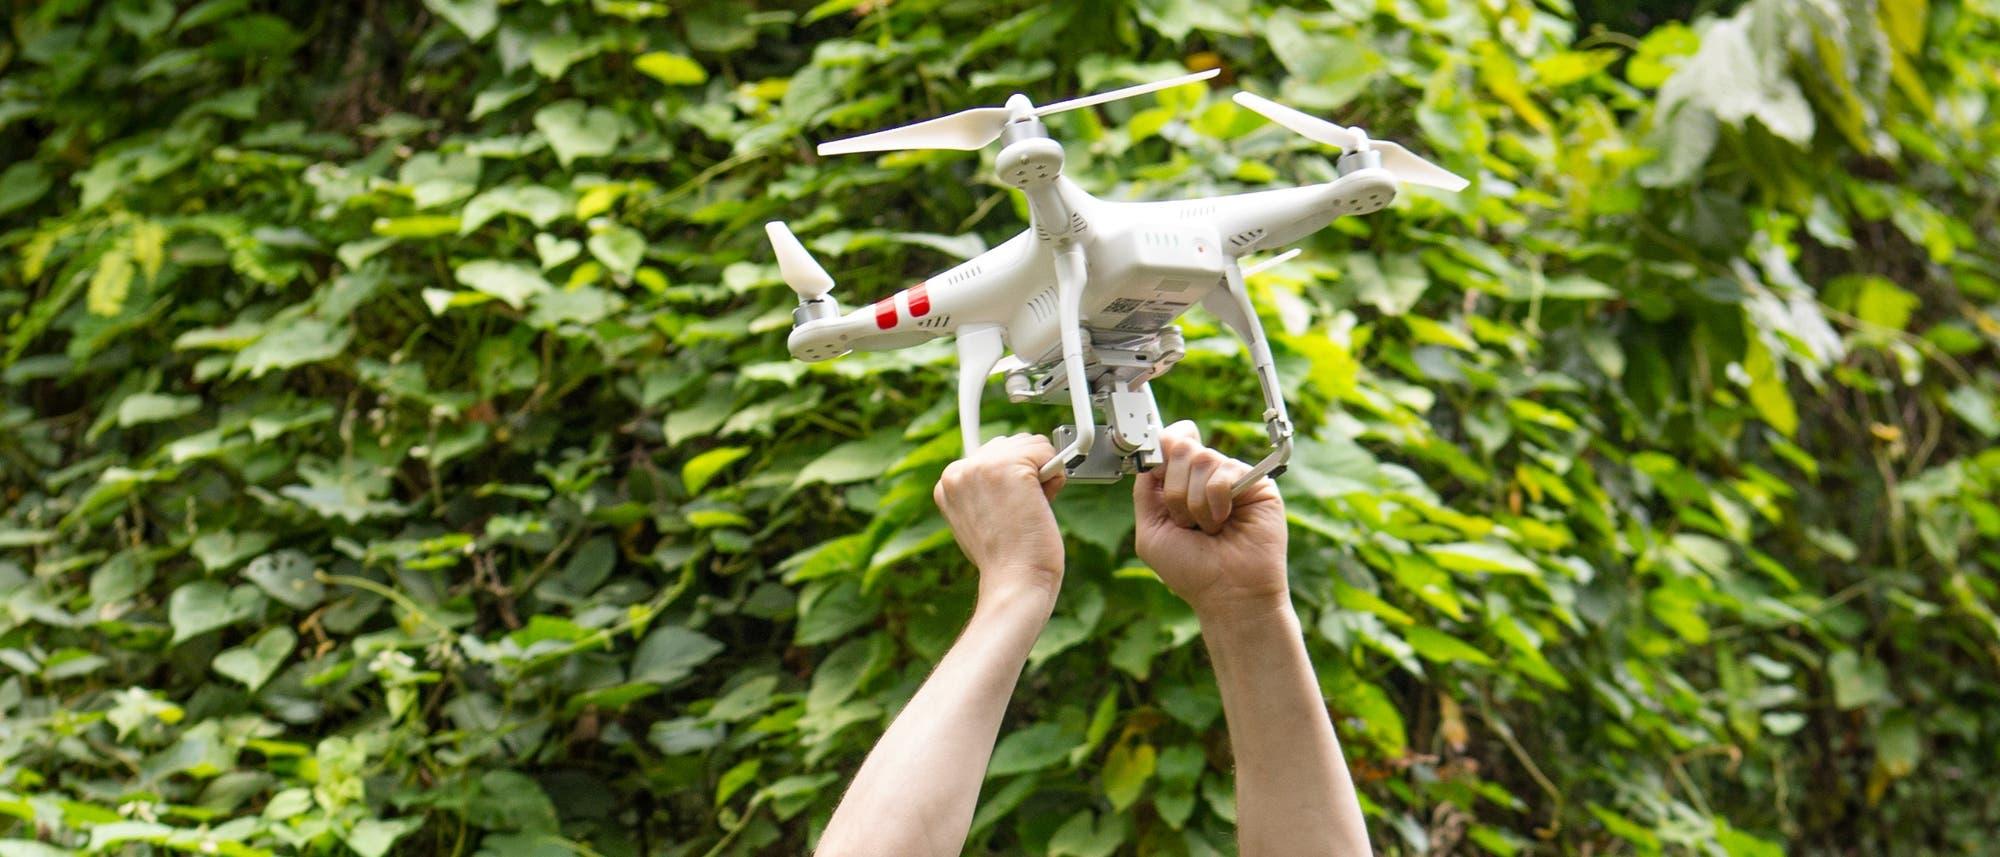 Drohne bein Feldversuch in Grenada